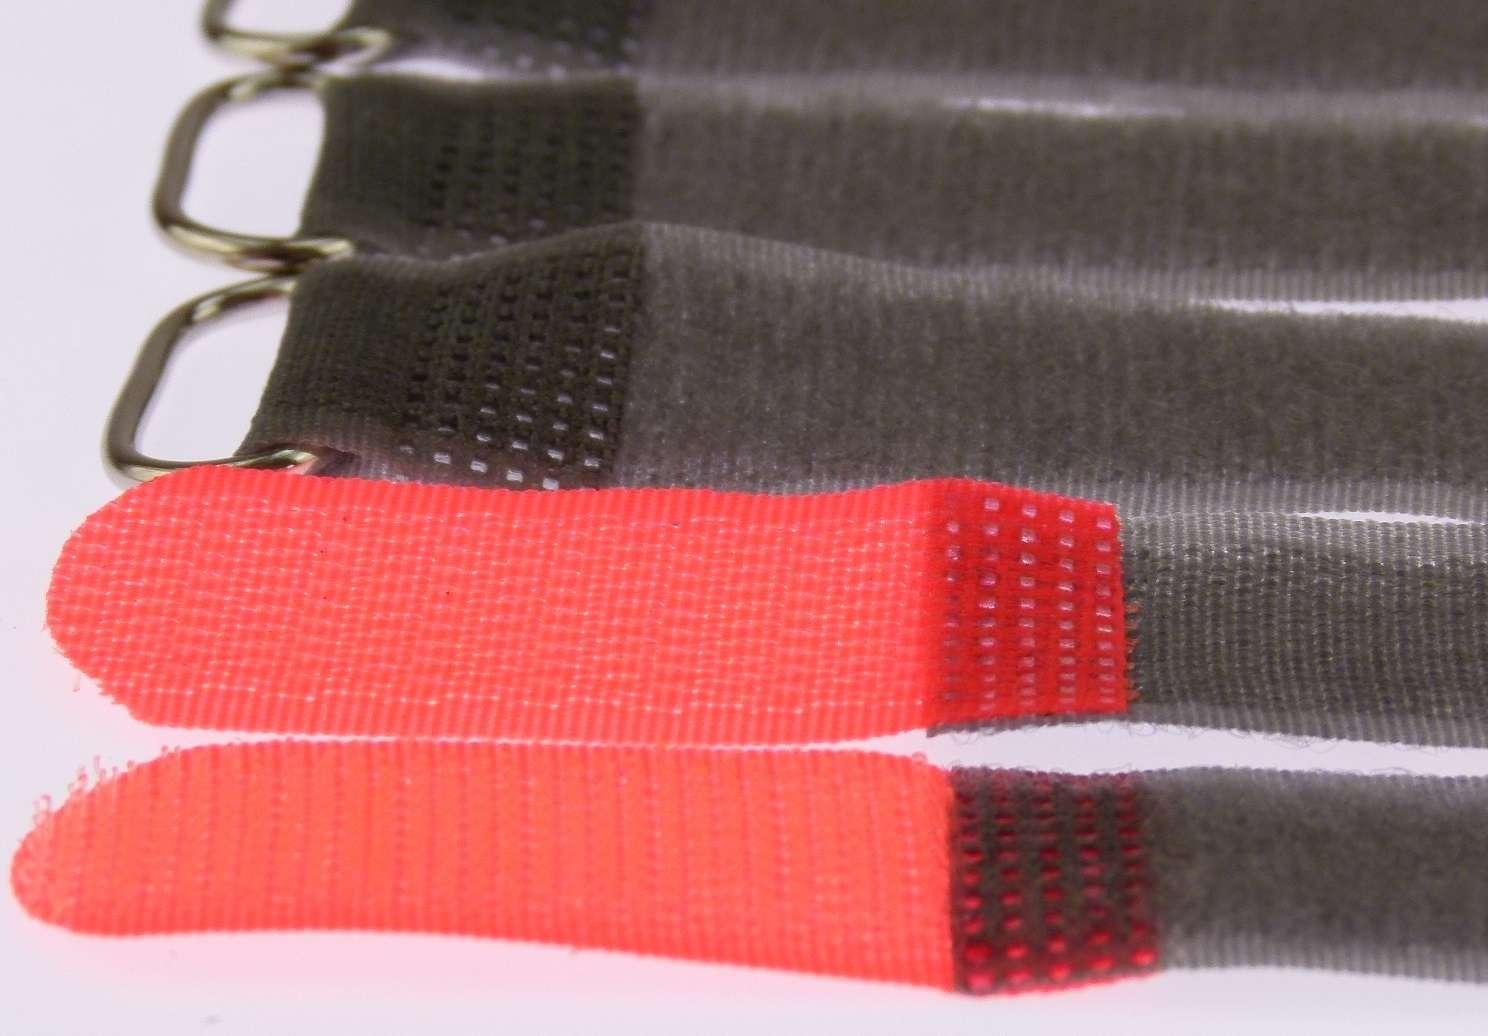 100 x Klettband Kabelbinder FK 20 cm x 20 mm neon rot Klettbänder Kabelklettband